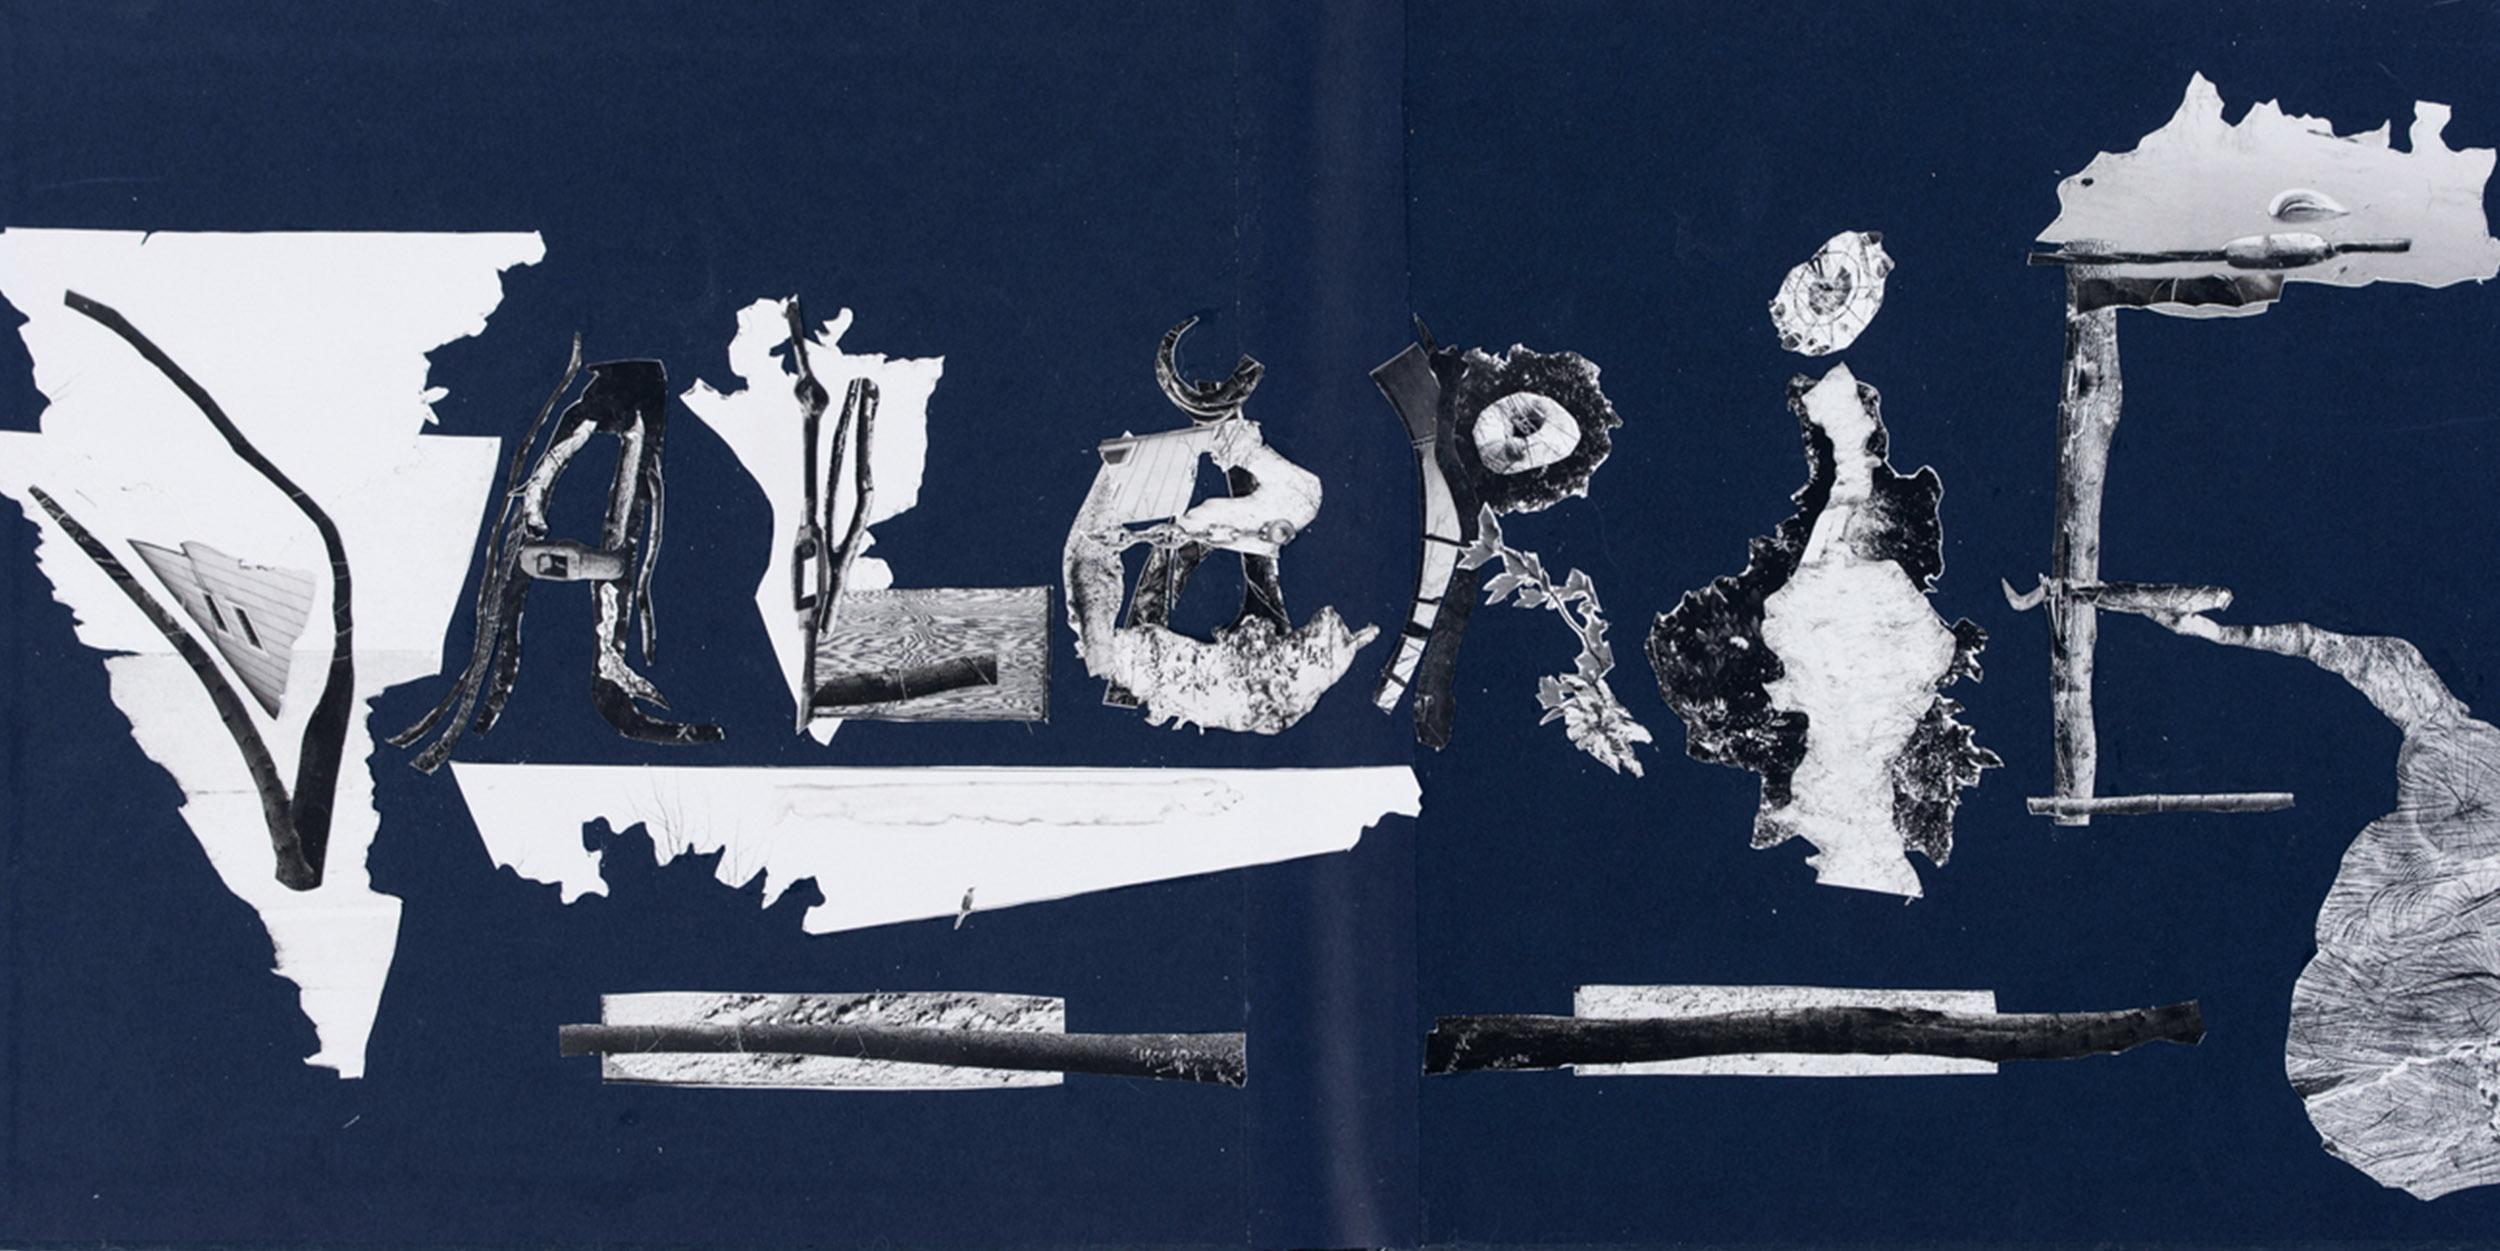 Justine Kurland's 'SCUMB Manifesto' creates a vision of female artistic legacy